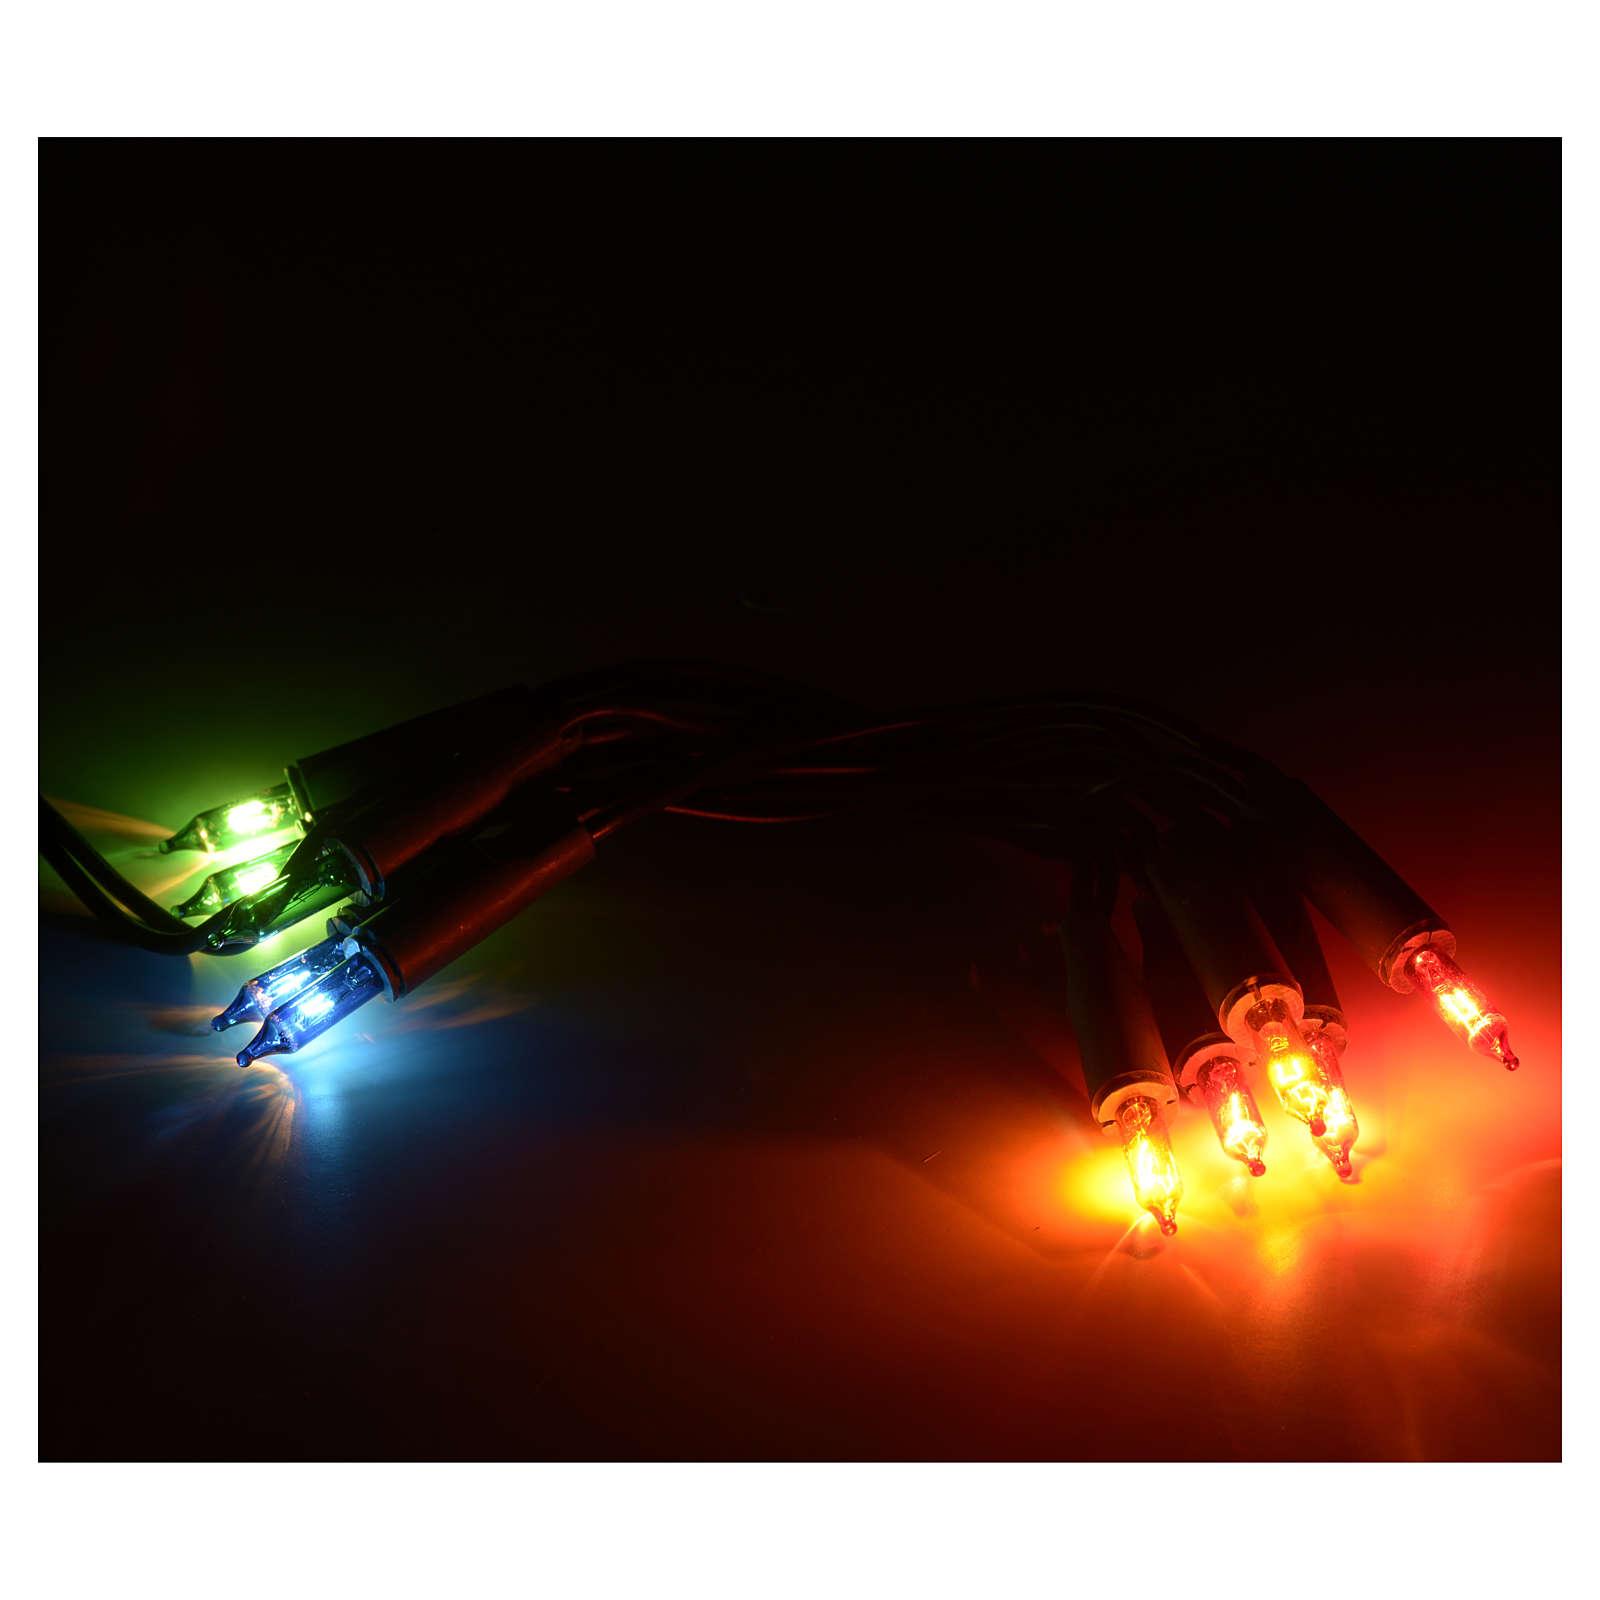 Guirlande lumineuse de noel 10 petites ampoules multicolore 3